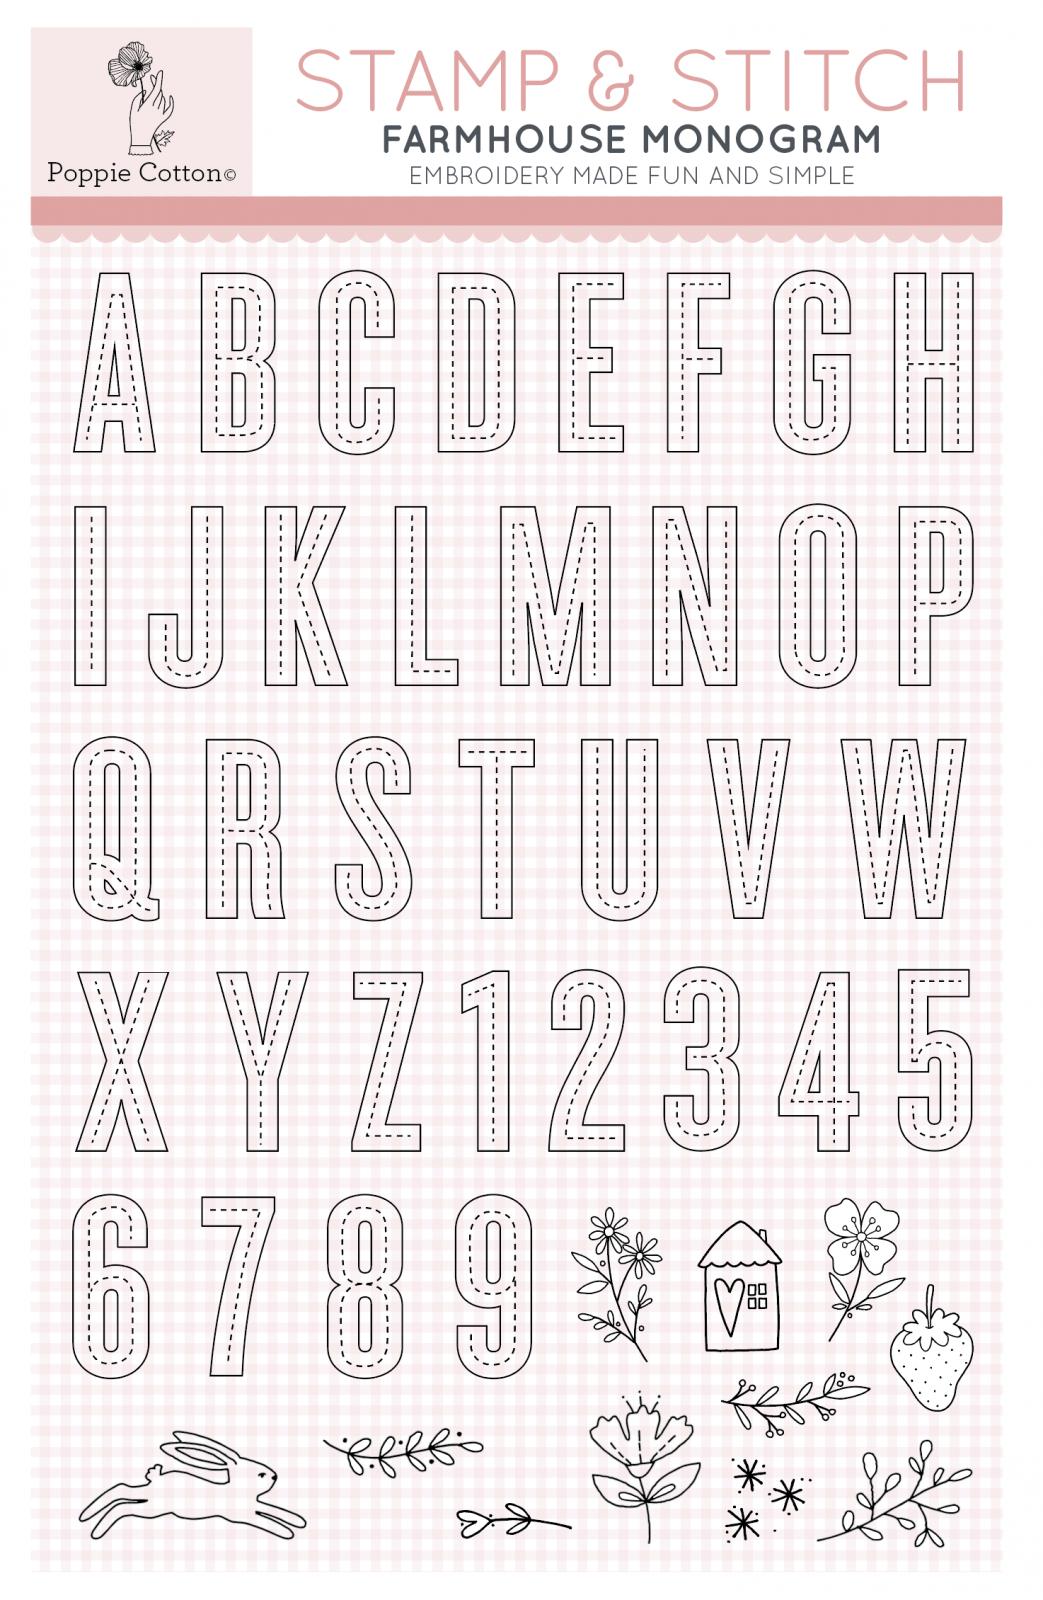 Stamp & Stitch Farmhouse Monogram